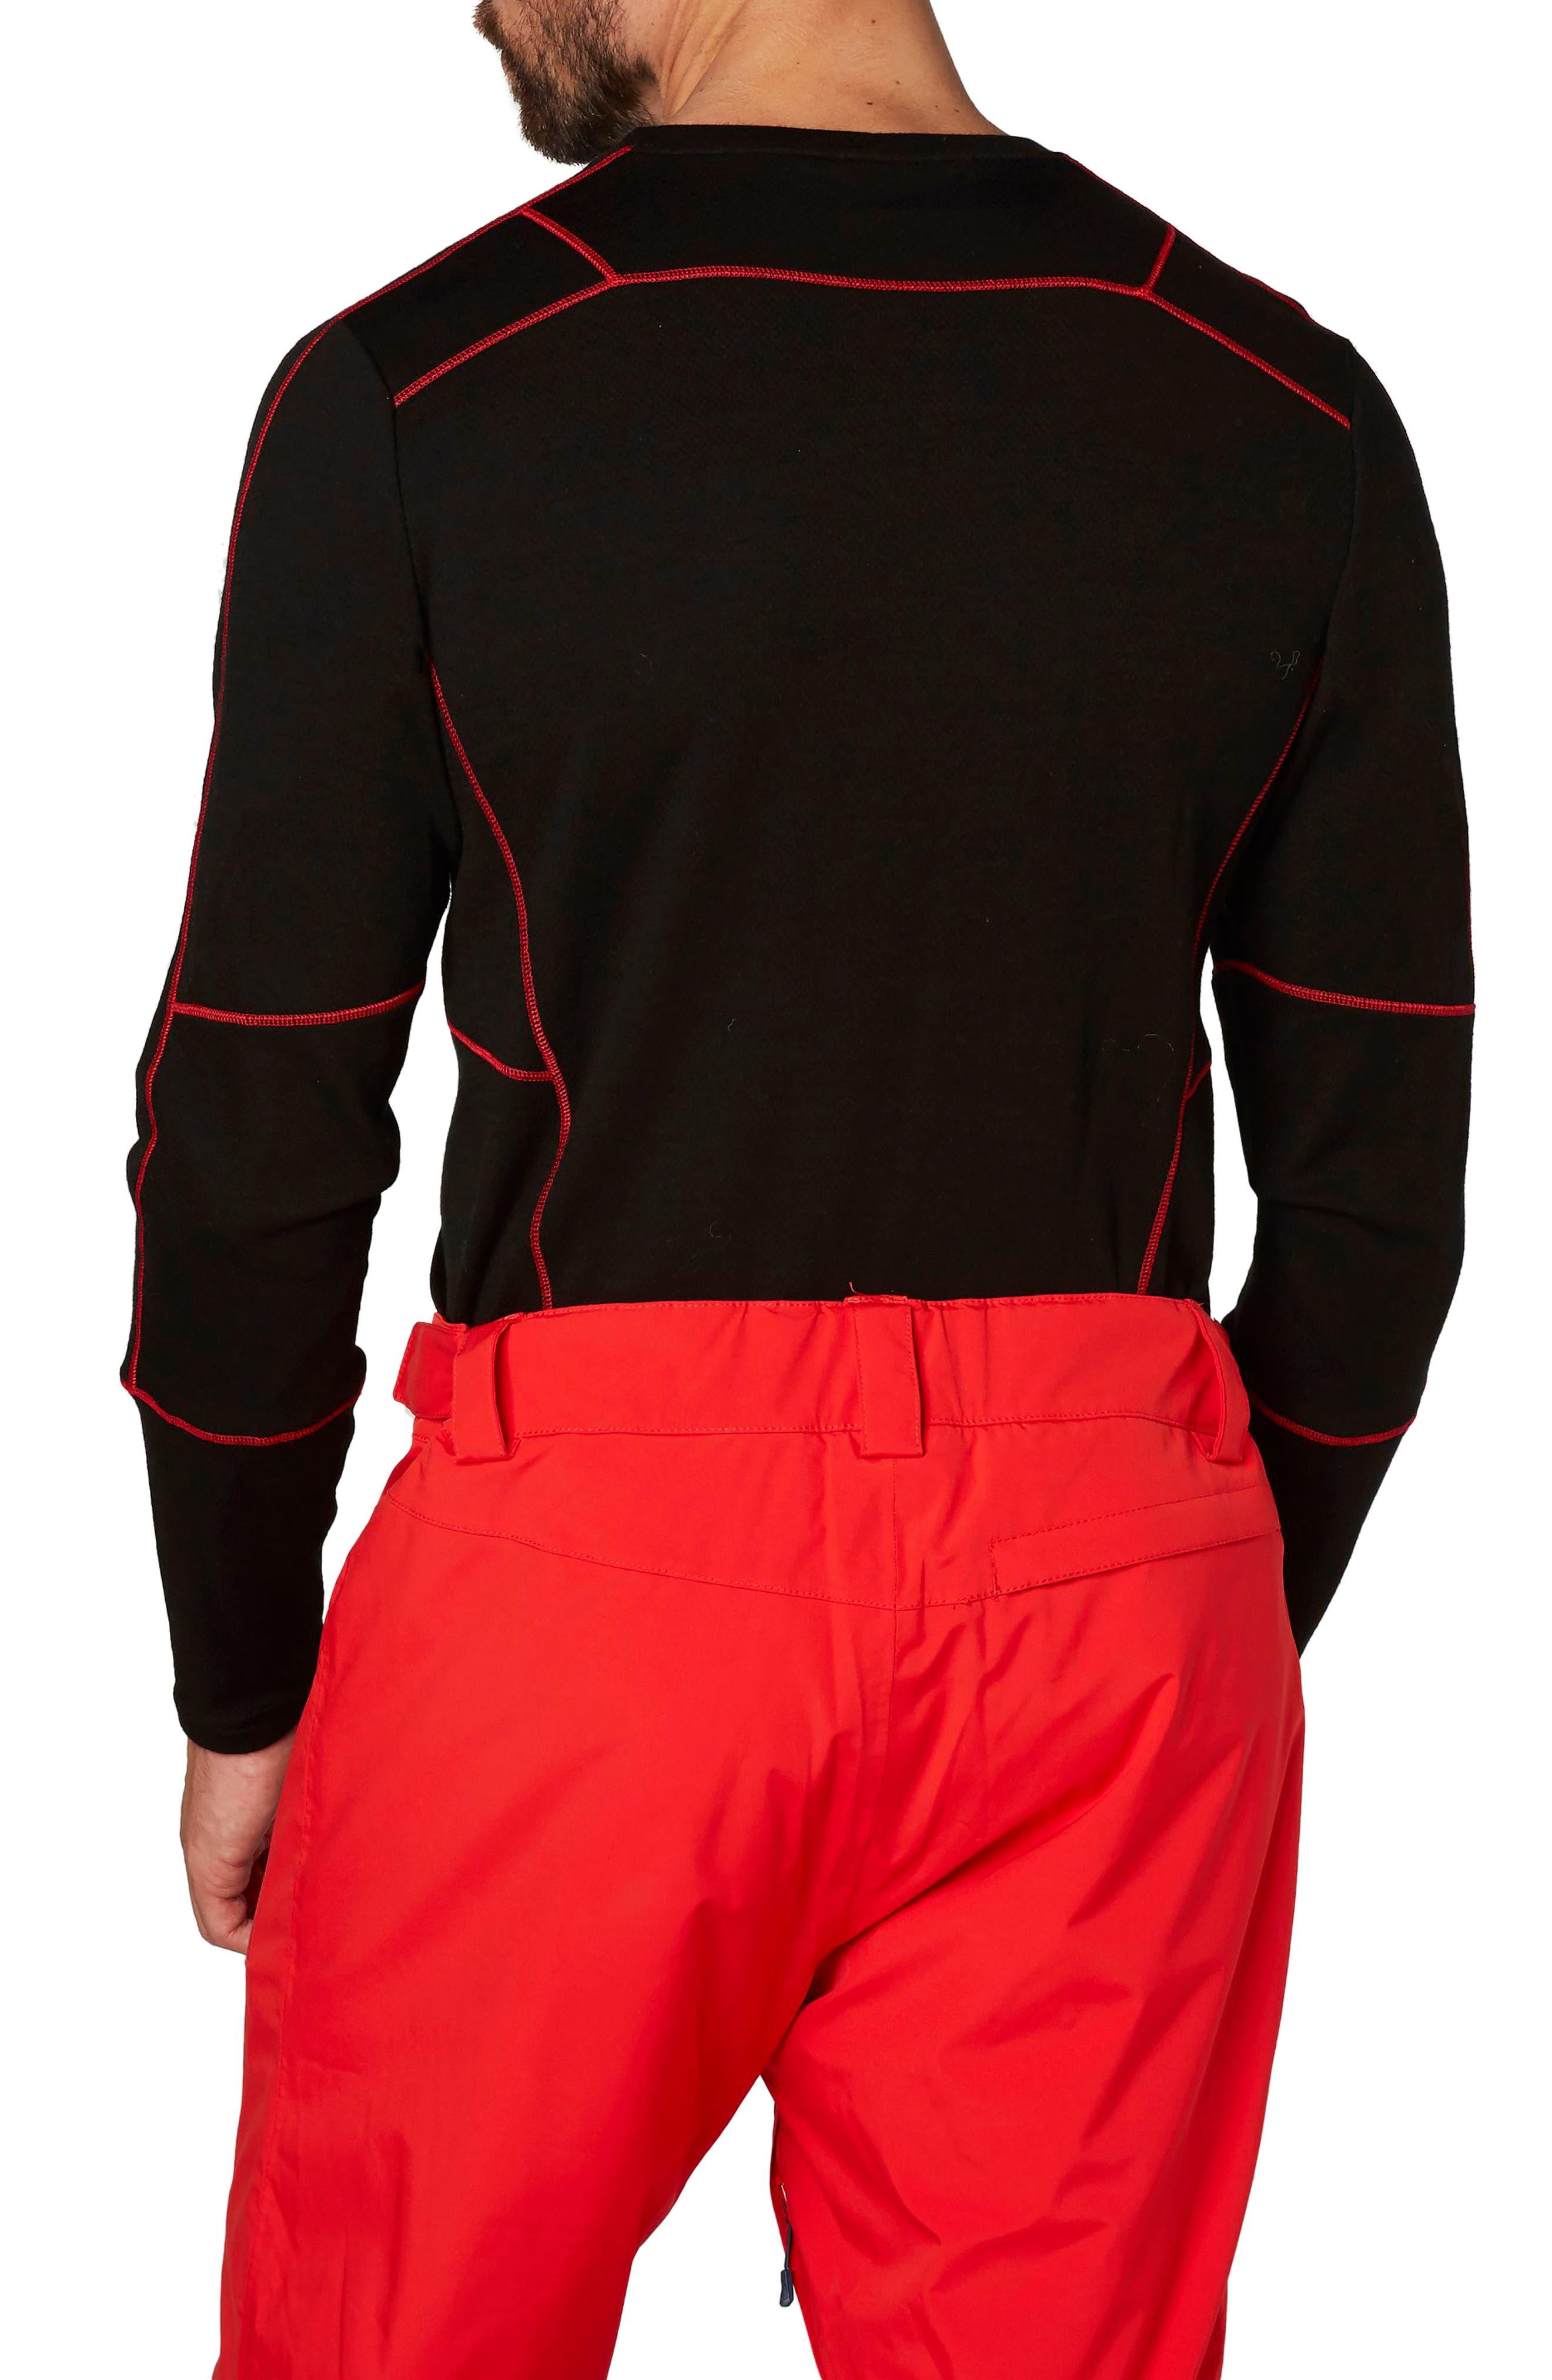 HH<sup>®</sup> Lifa Merino Max Crewneck Pullover,                             Alternate thumbnail 2, color,                             Black / Flag Red